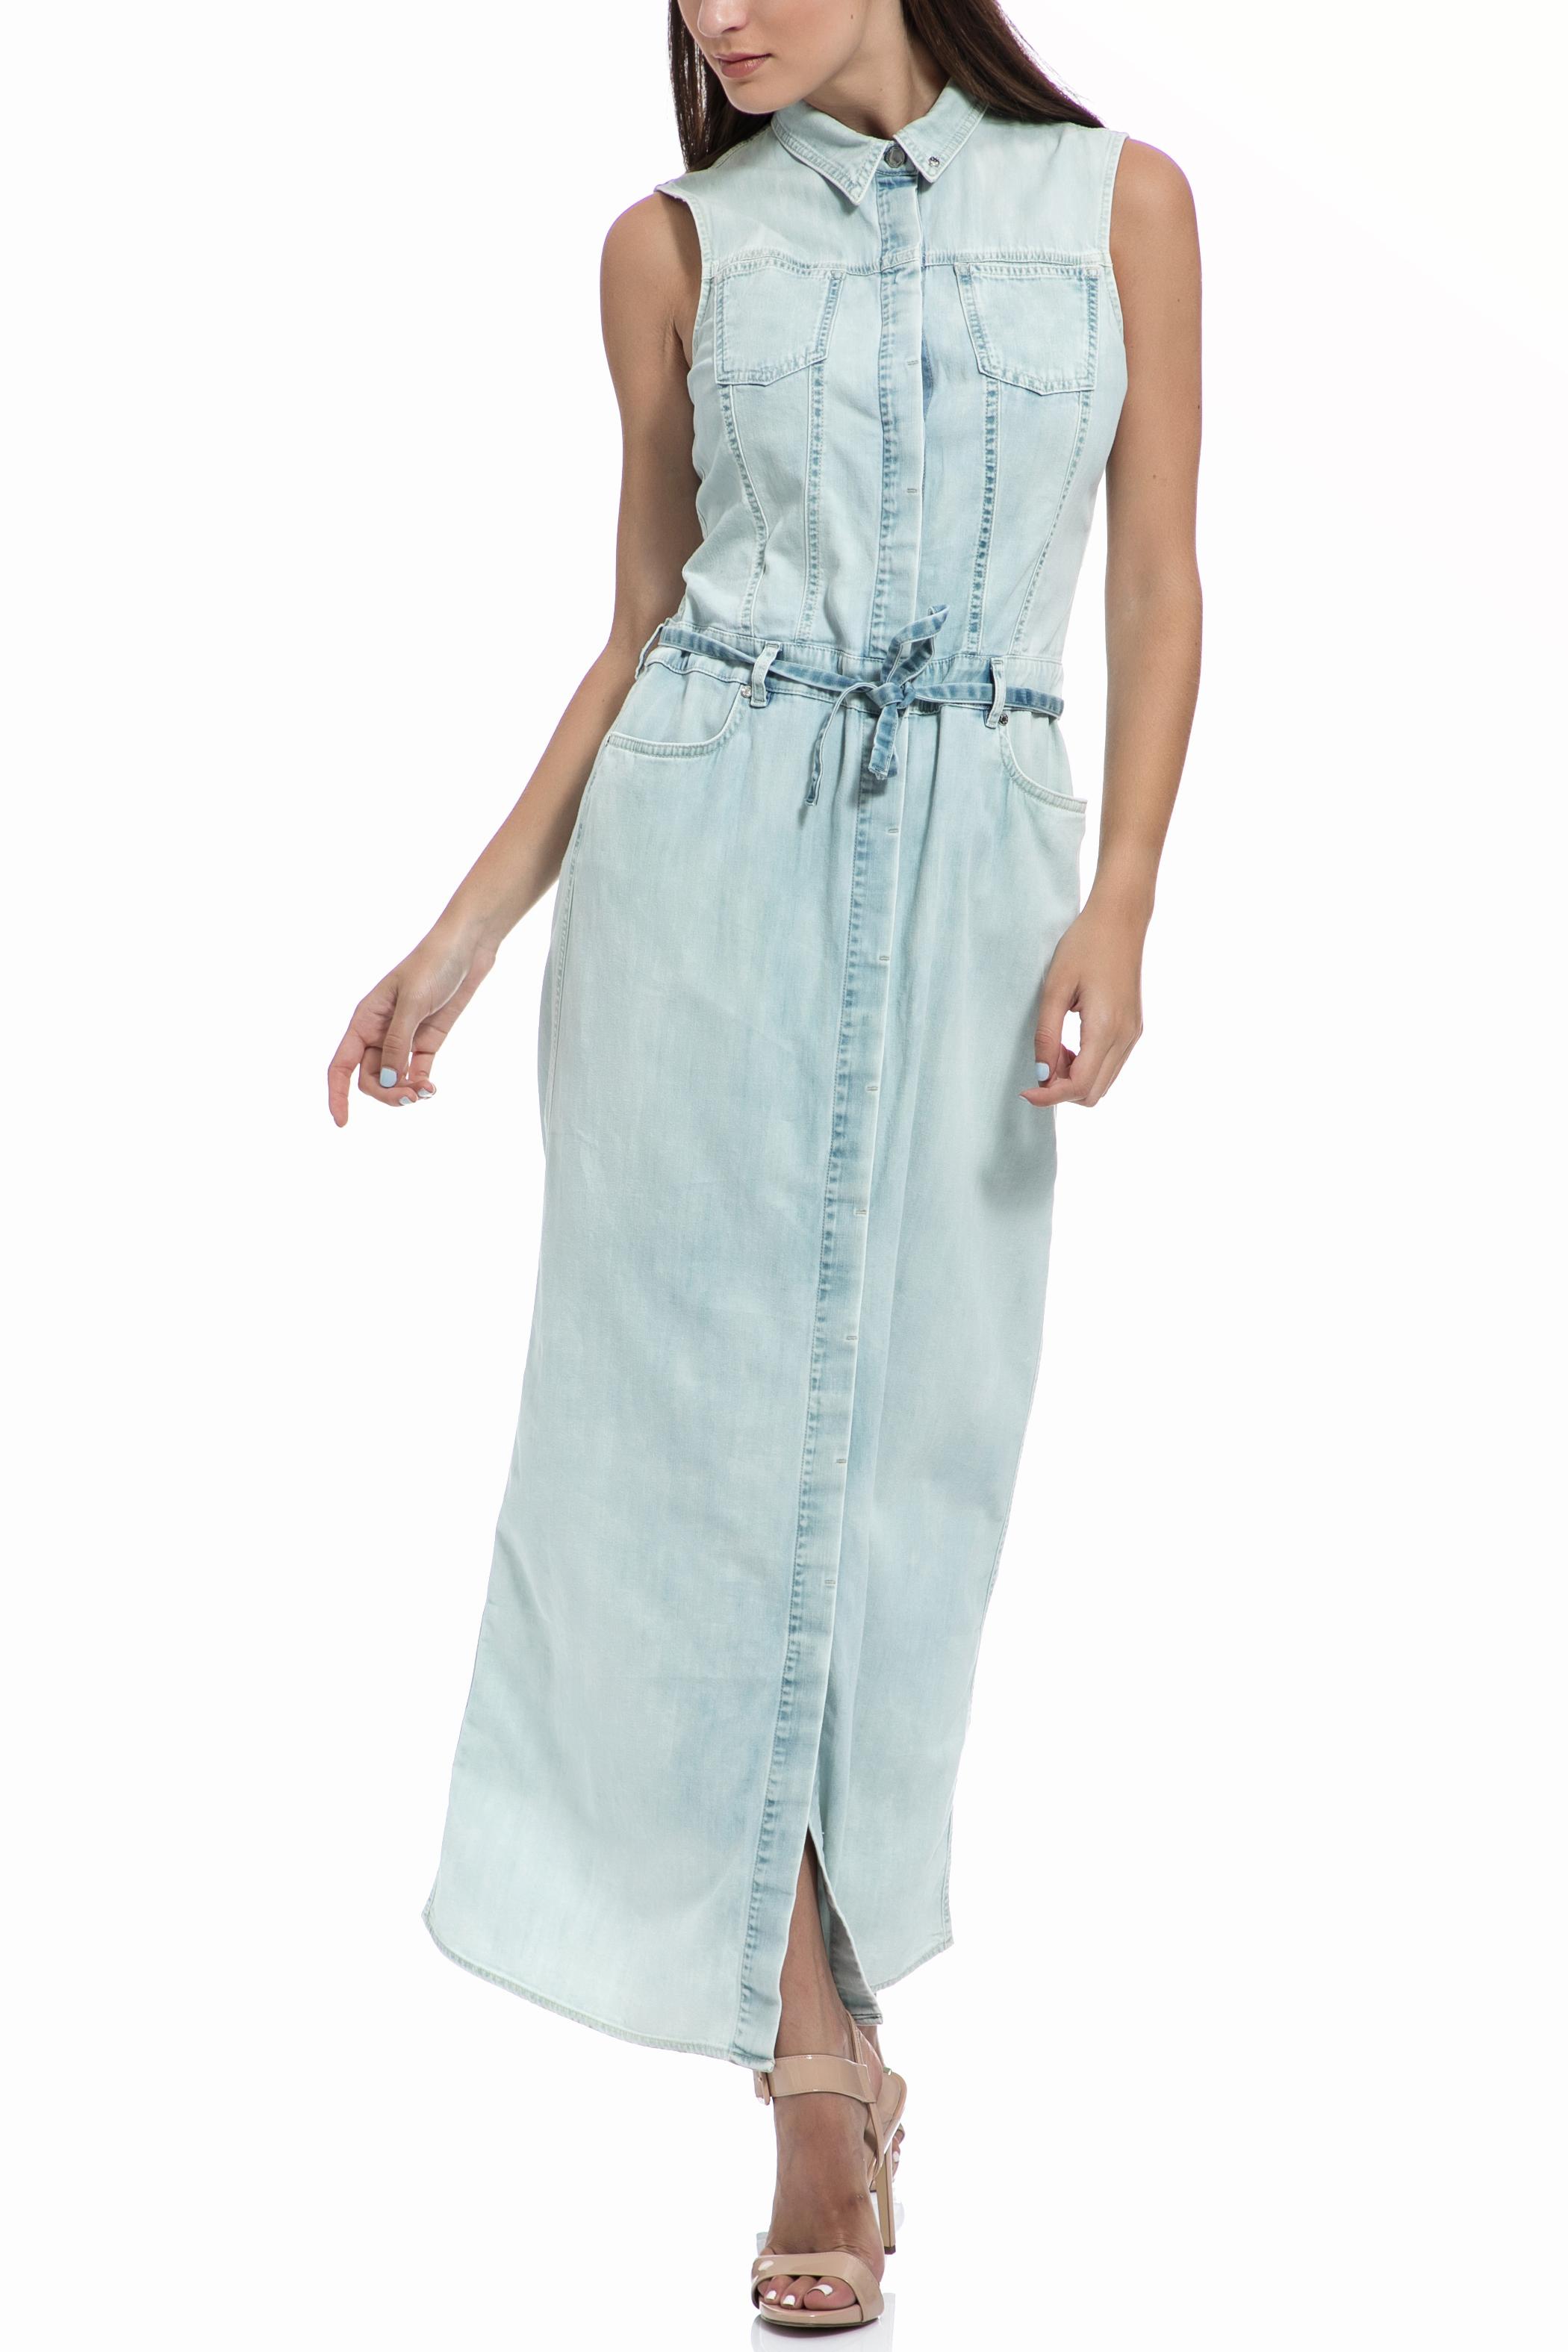 GAS - Μάξι ντένιμ φόρεμα GAS γαλάζιο γυναικεία ρούχα φορέματα μάξι